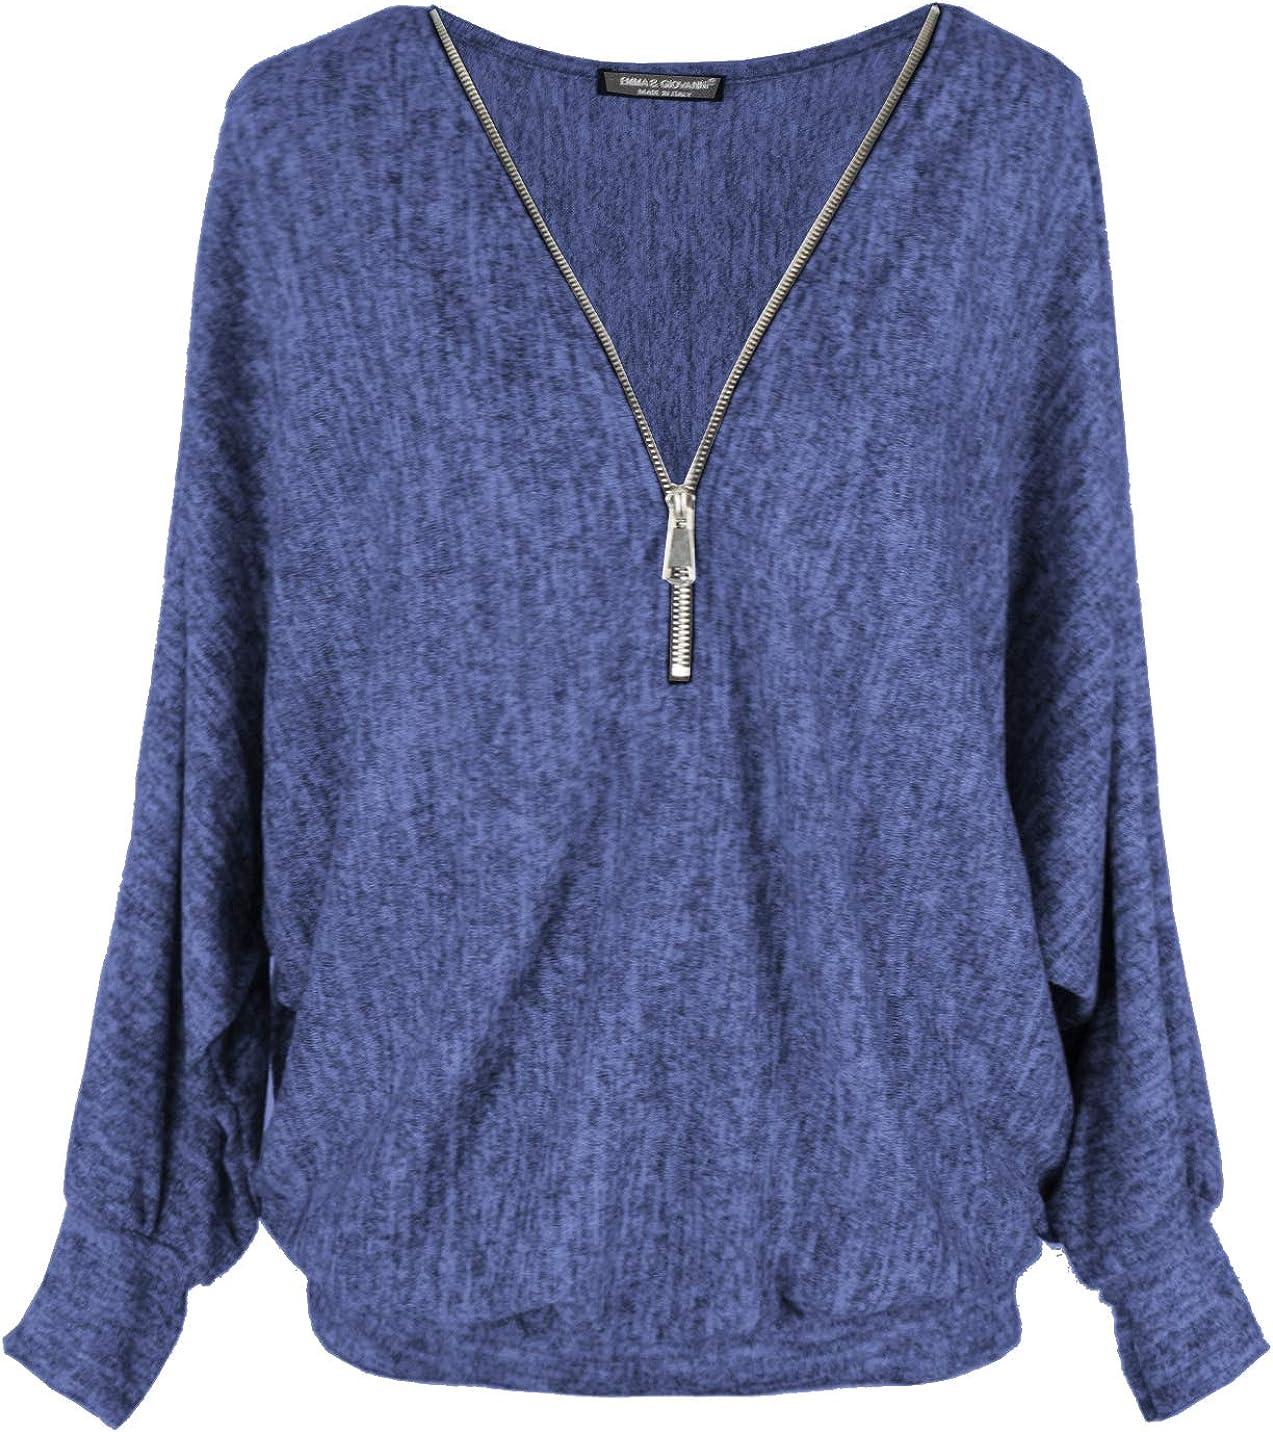 Pullover mit Spitze Made In Italy Oversize Oberteile - Damen Emma /& Giovanni